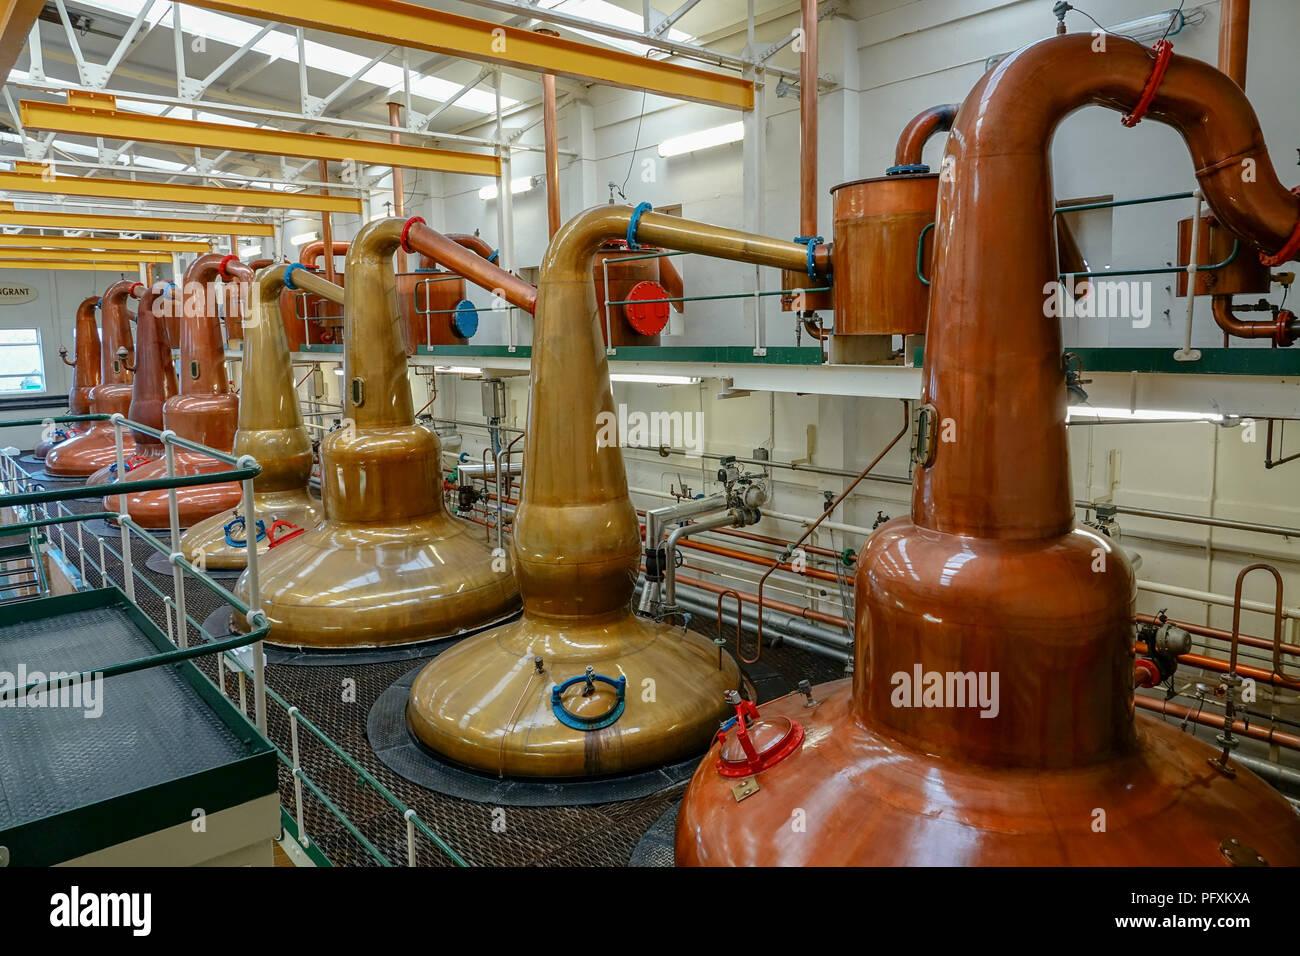 Whiskey stills at the Glen Grant distillery in the highlands, Scotland - Stock Image